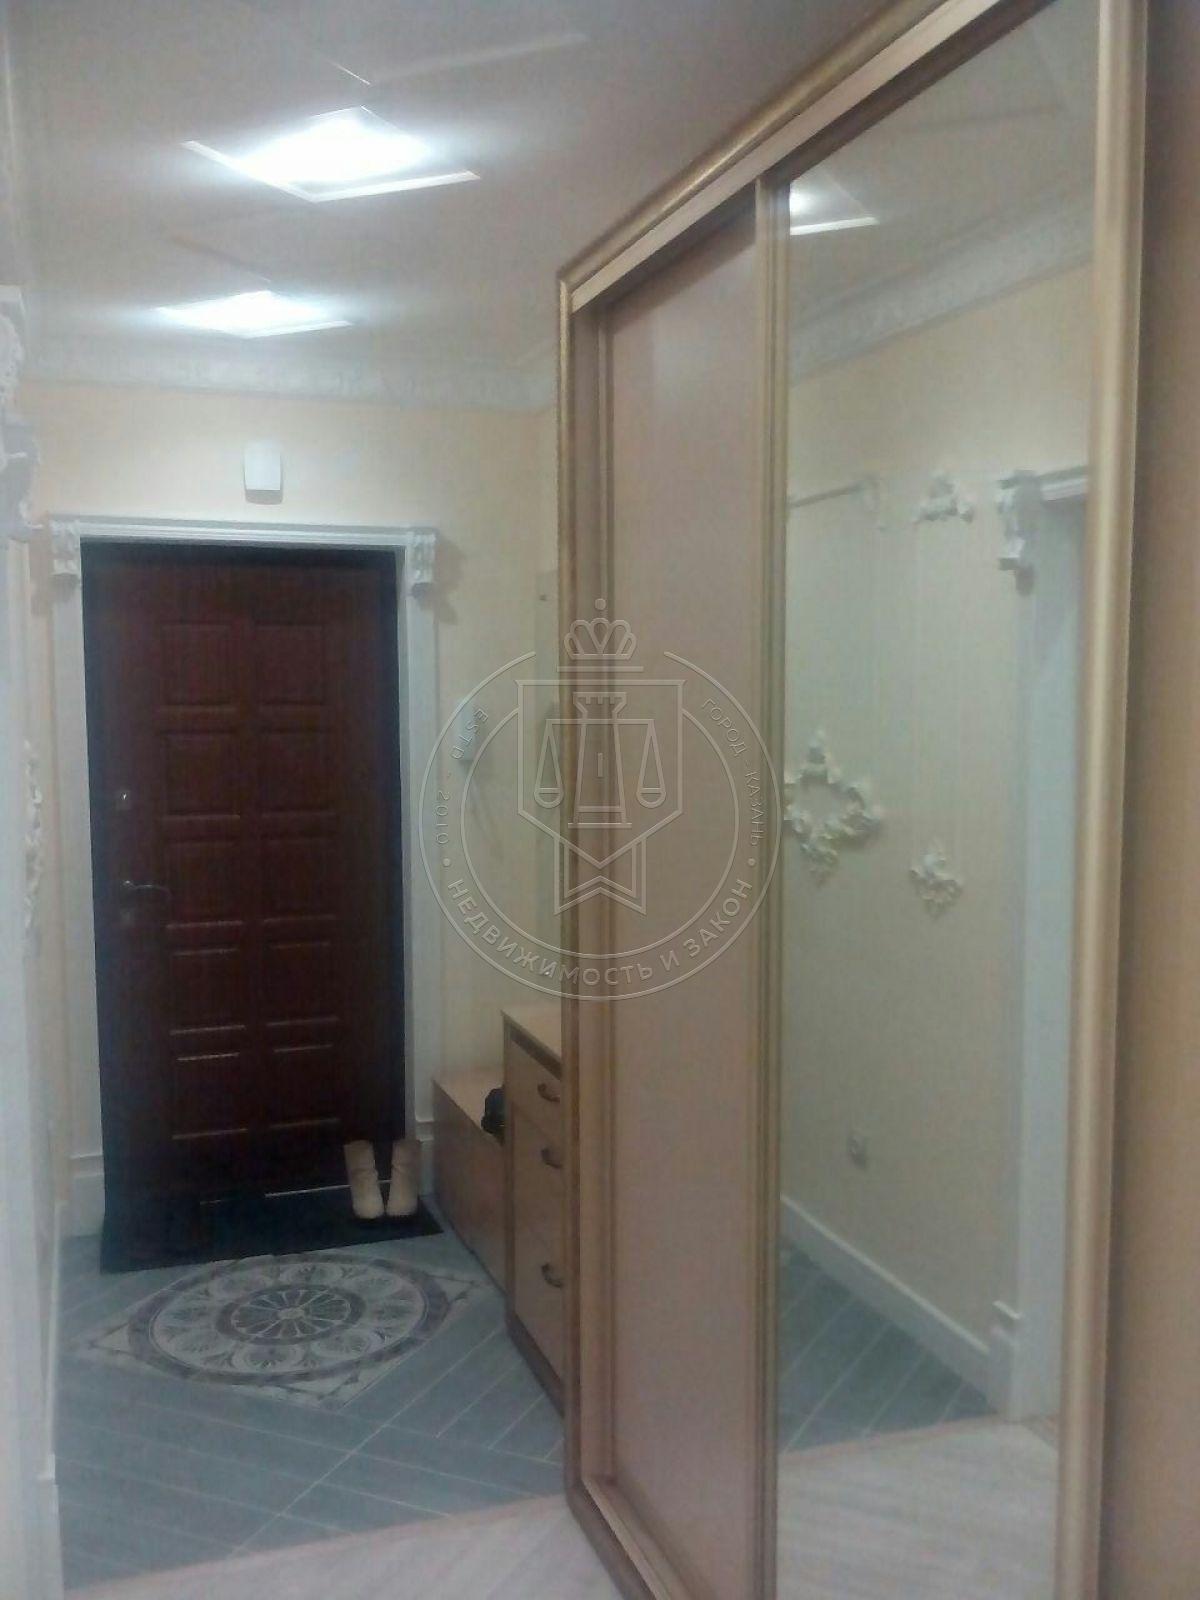 Продажа 2-к квартиры Четаева ул, 10, 68.0 м² (миниатюра №5)